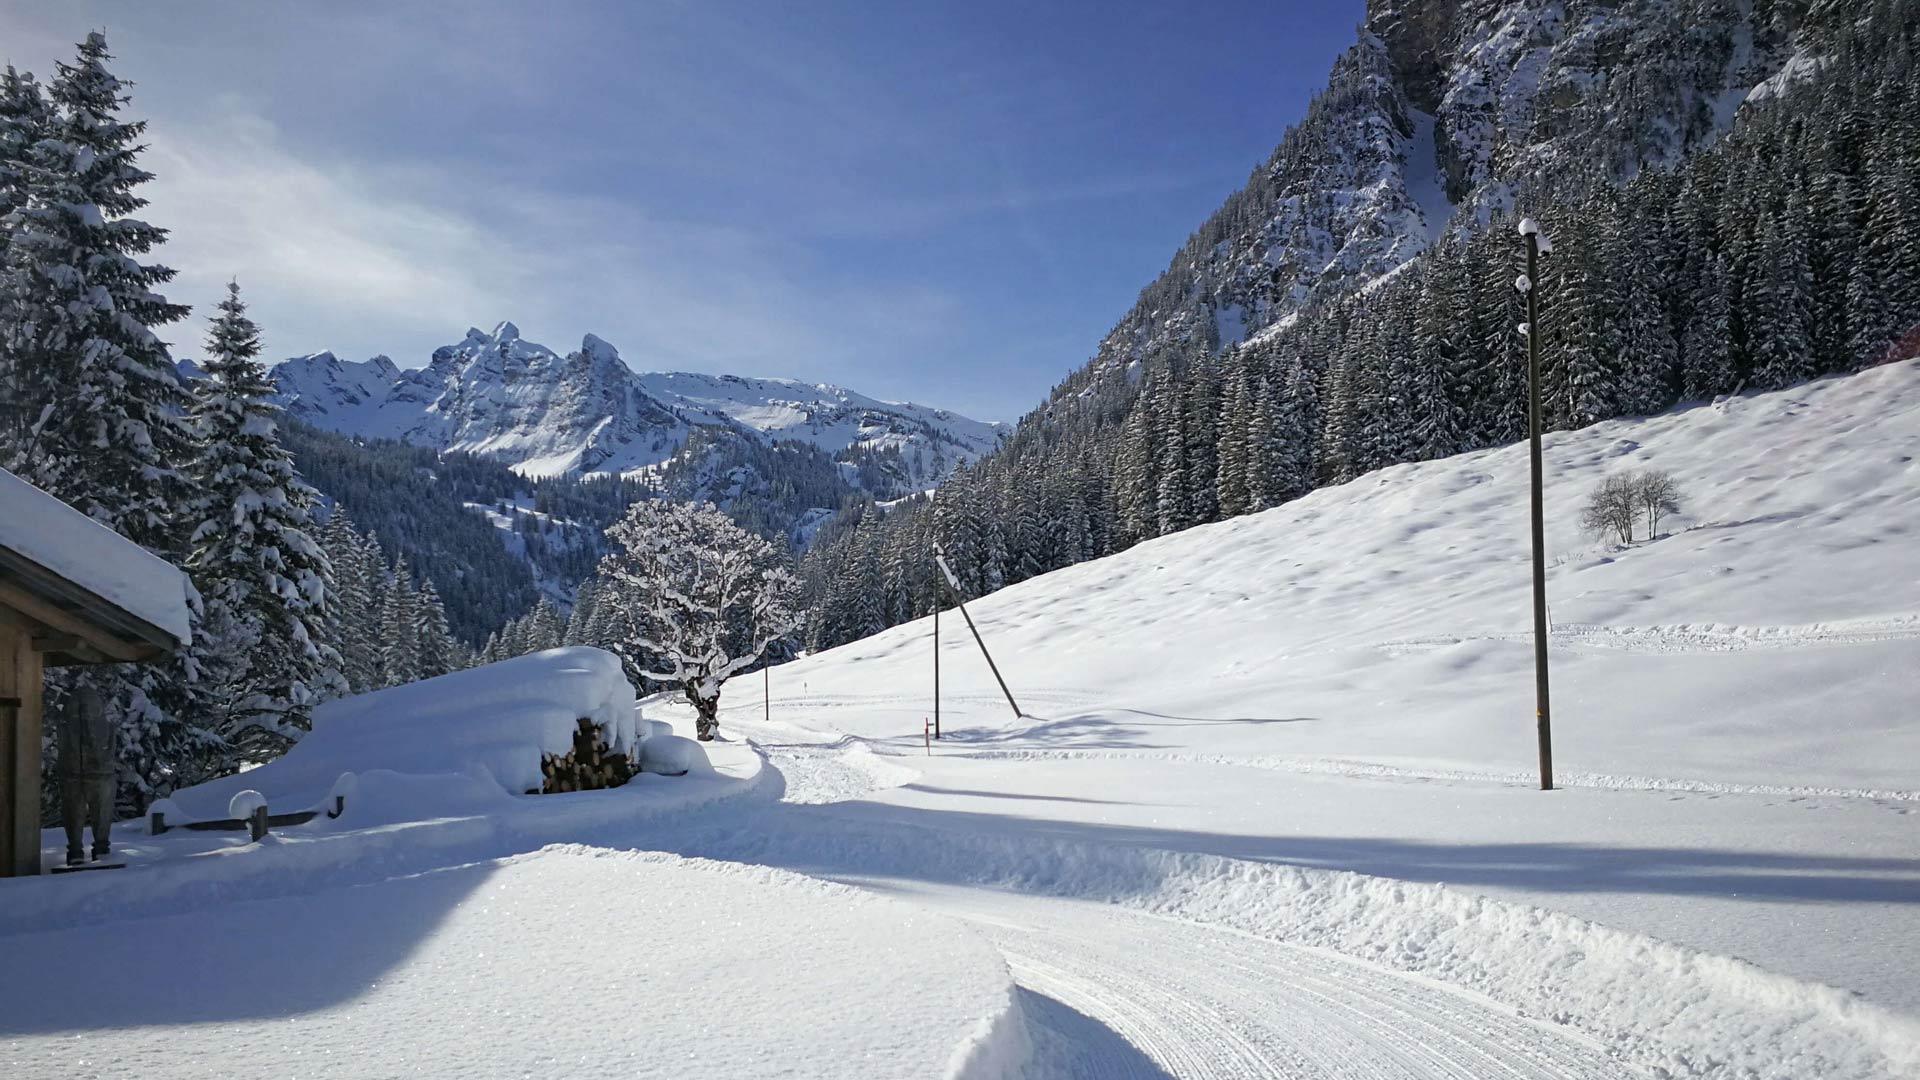 naturpark-diemtigtal-winter-langlauf-loipe-grimmimutz-blick-spillgerte